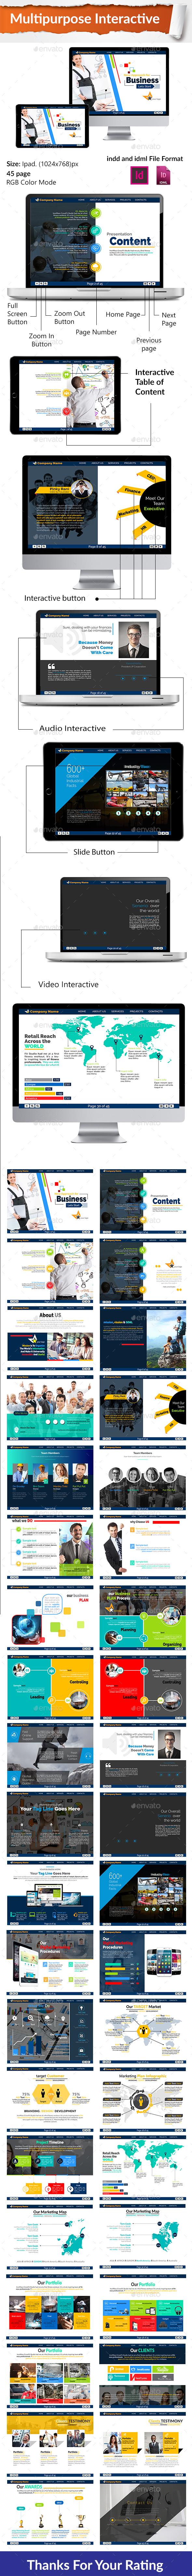 Multipurpose Interactive PDF - Digital Books ePublishing